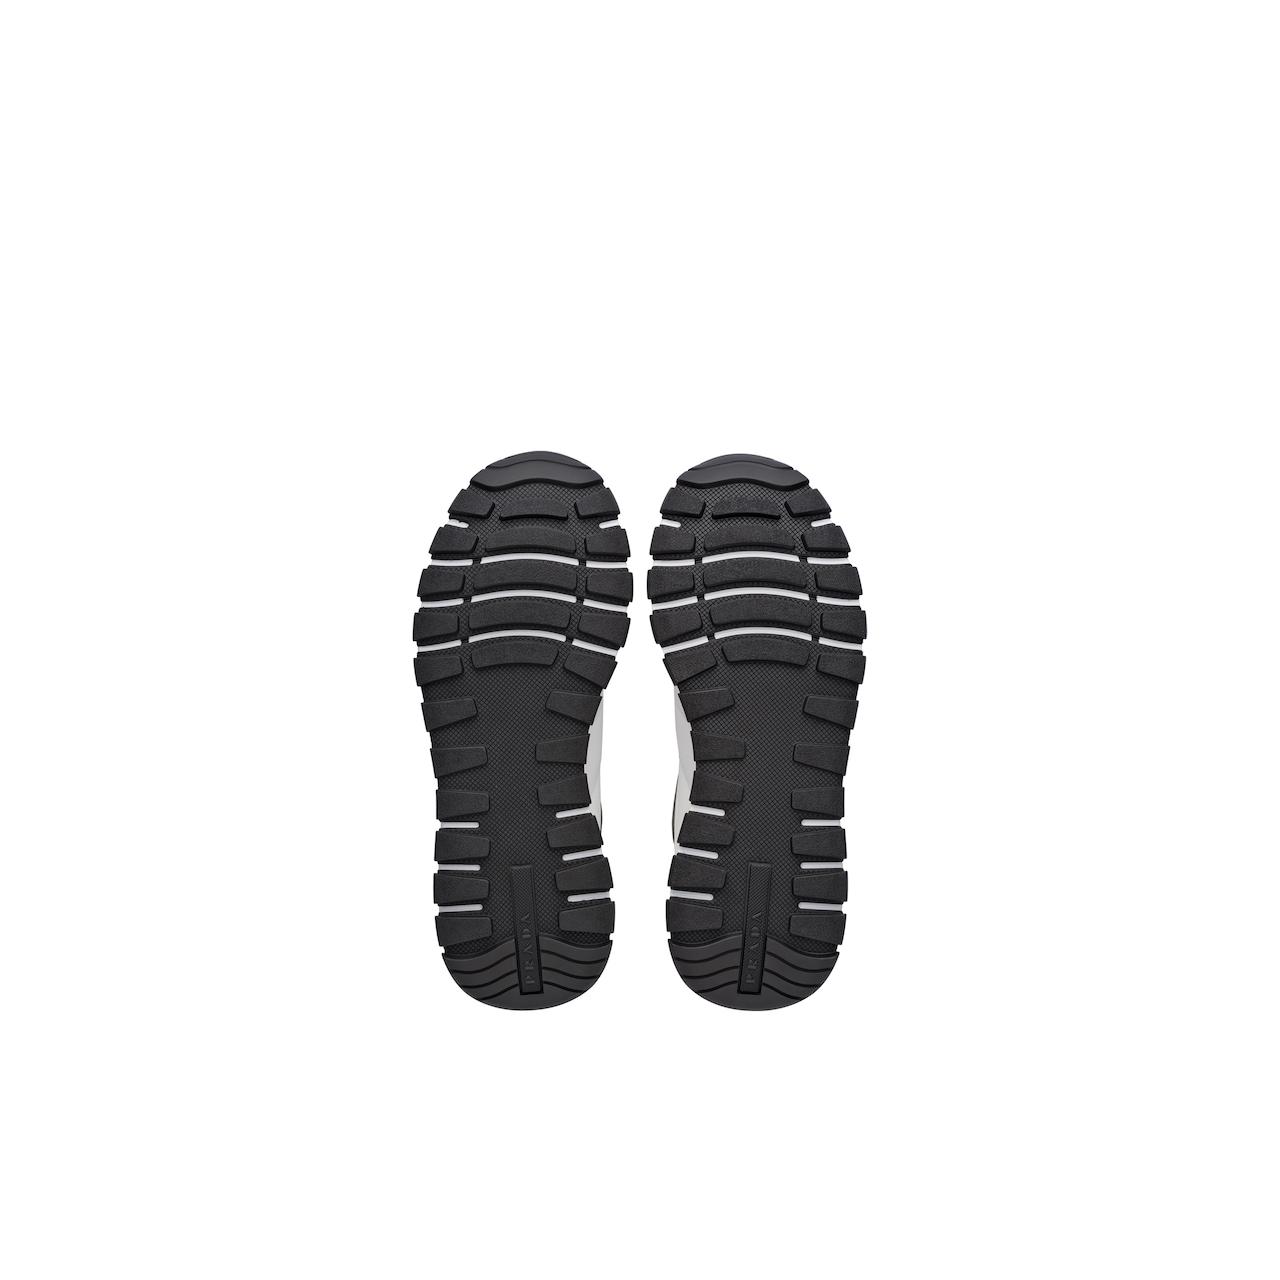 Prada PRAX 01 华达呢运动鞋 5